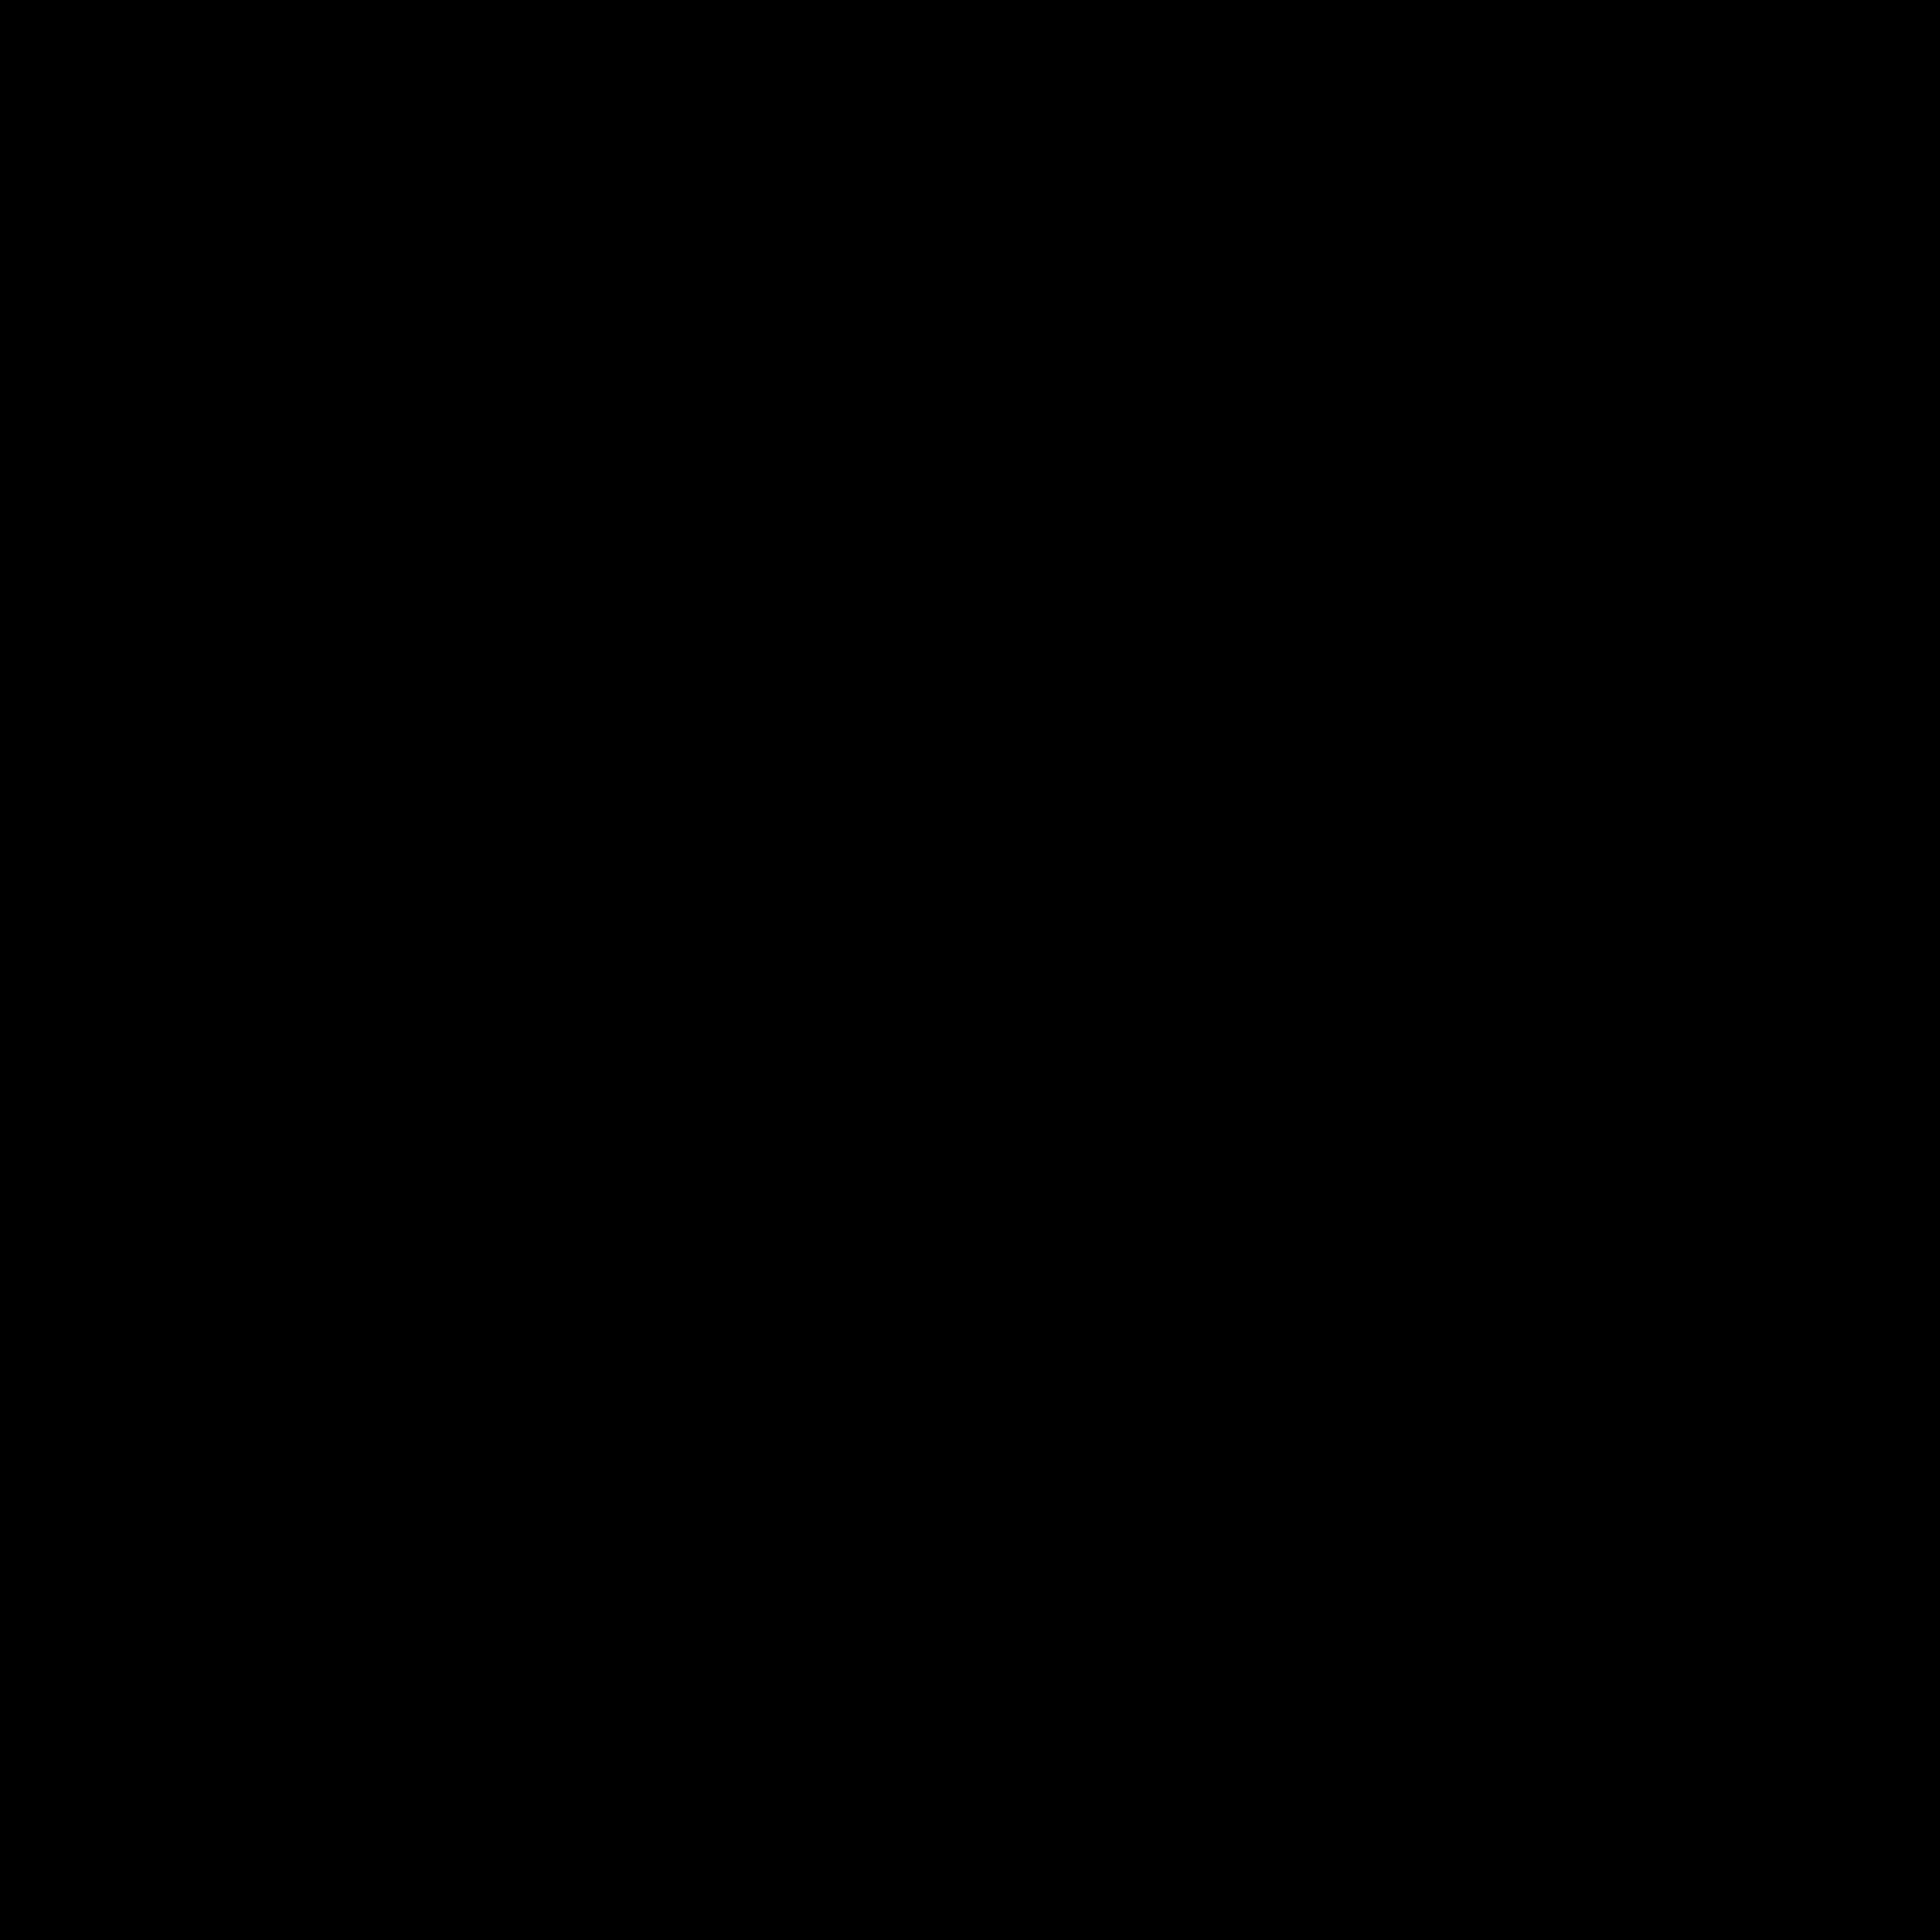 2000px-Enneagram_Symbol_-_Simple.png